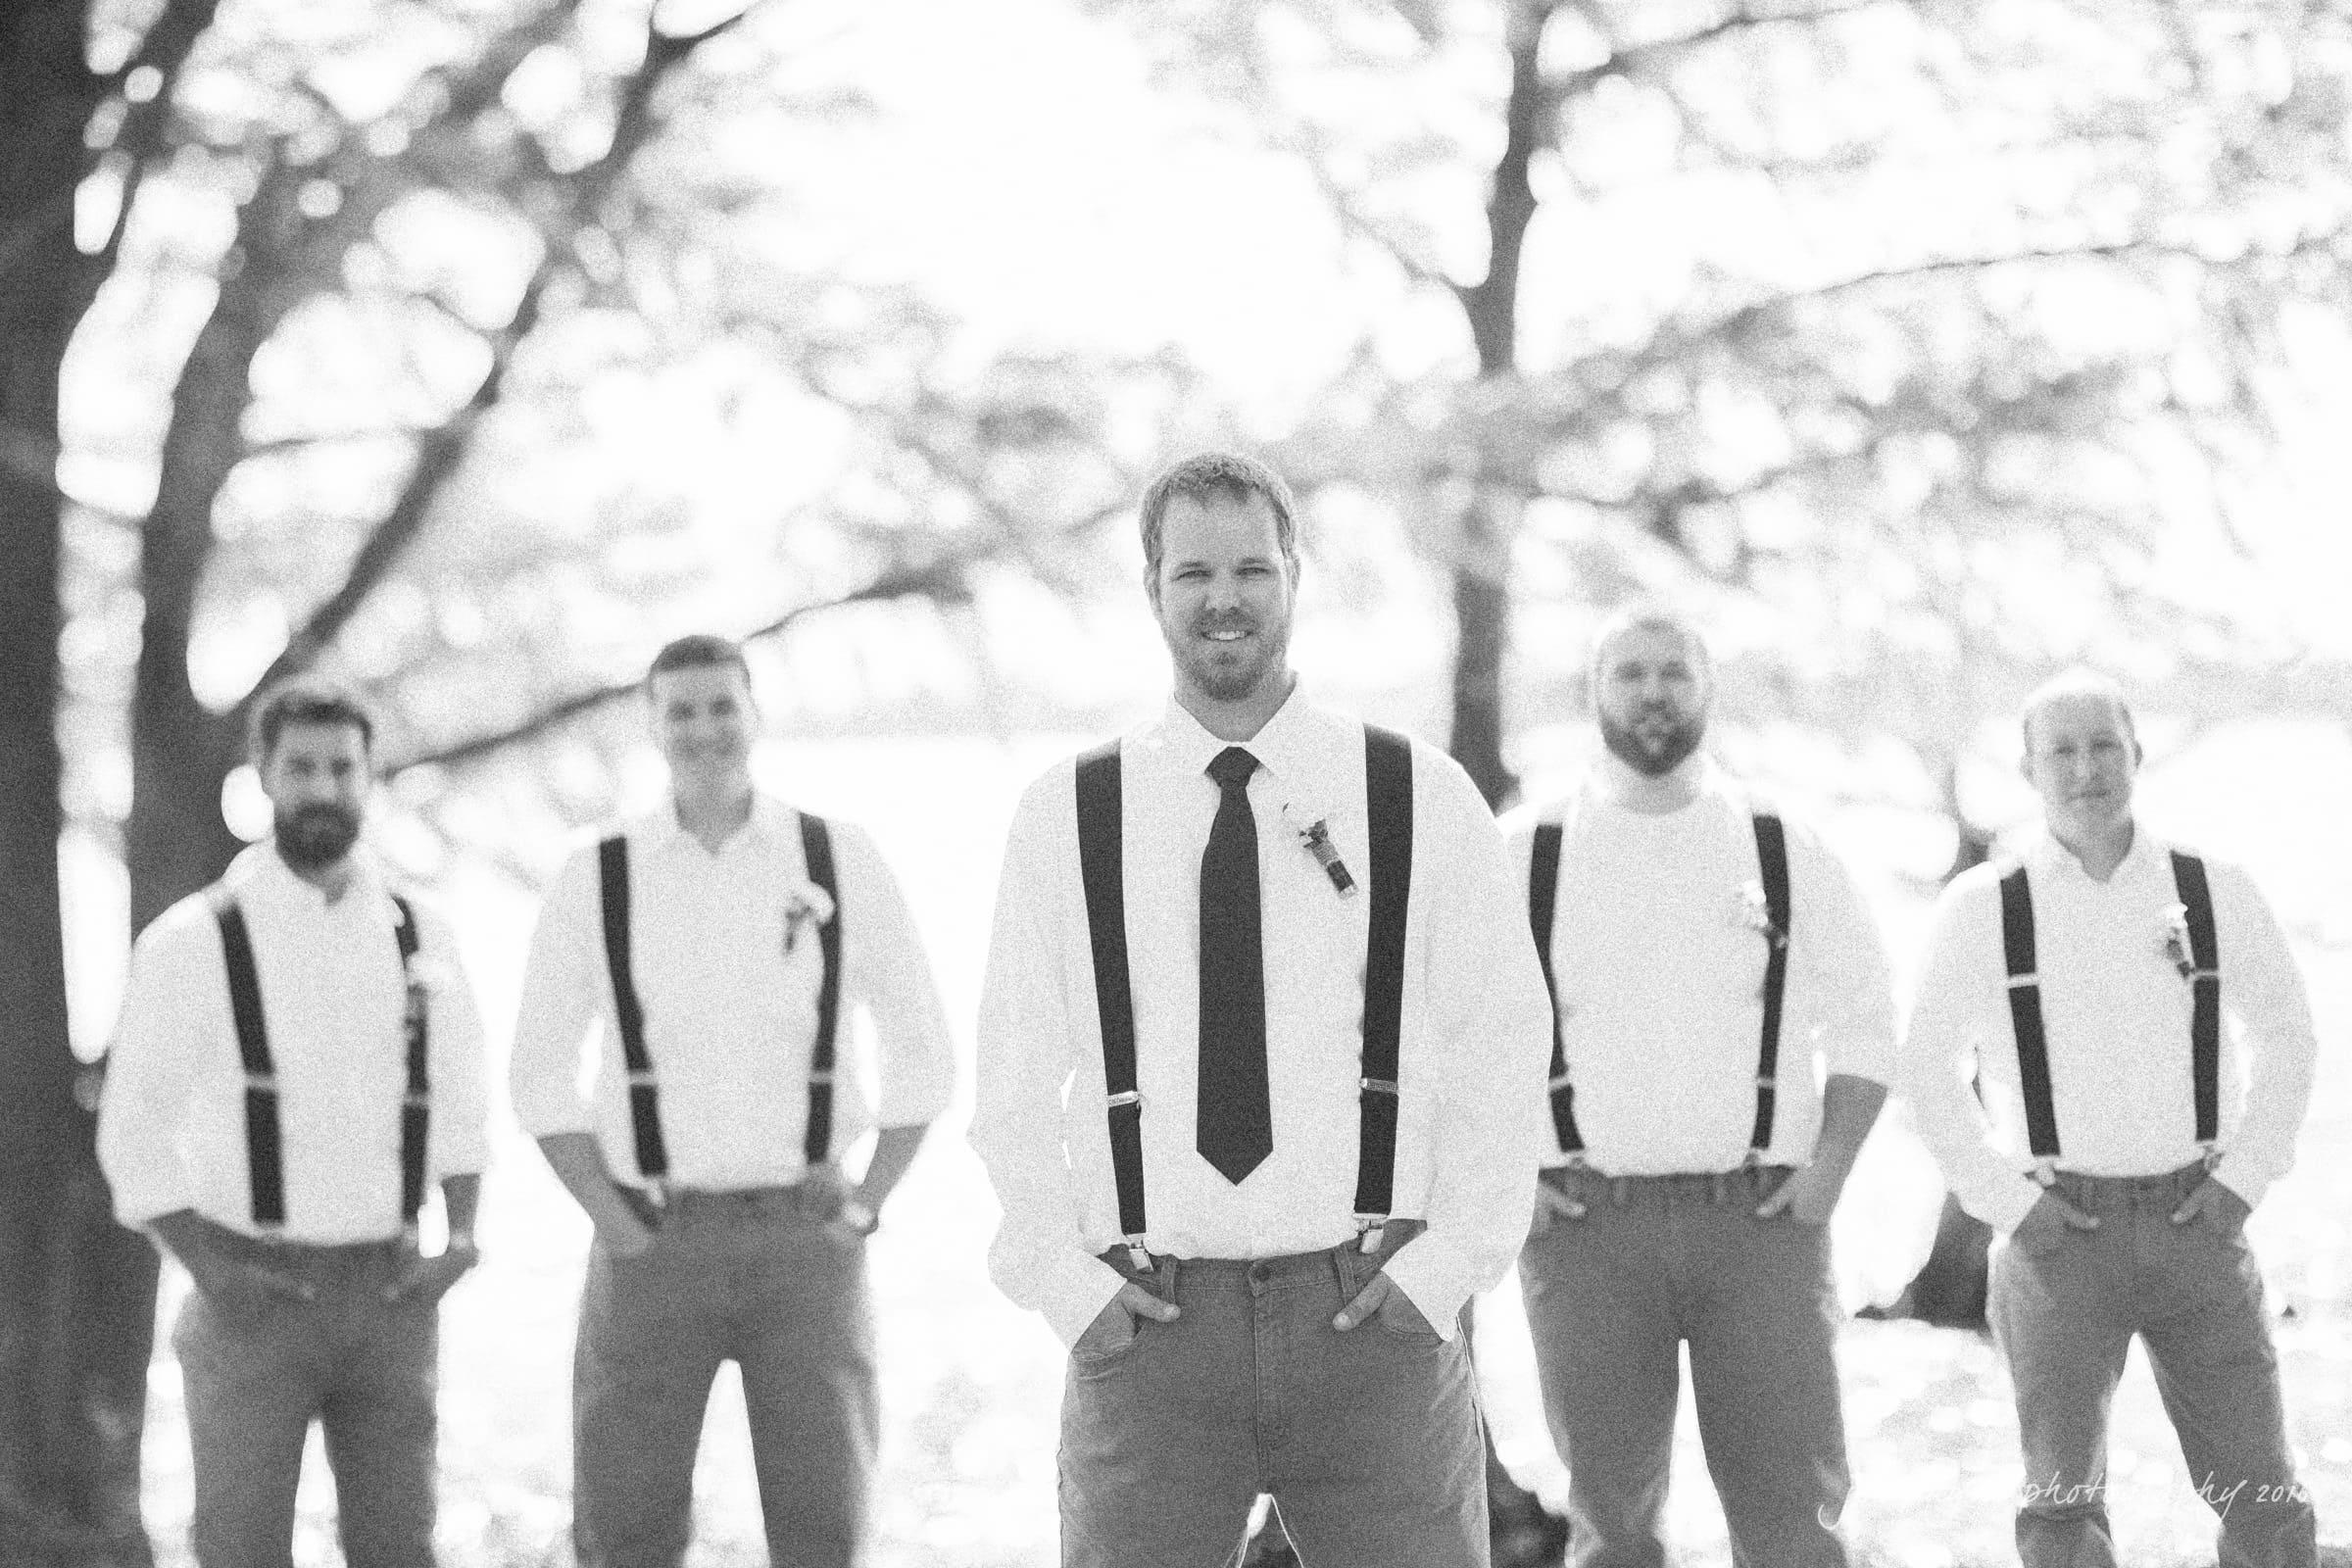 New Bern Wedding Photography - Jessica & Brinson-14